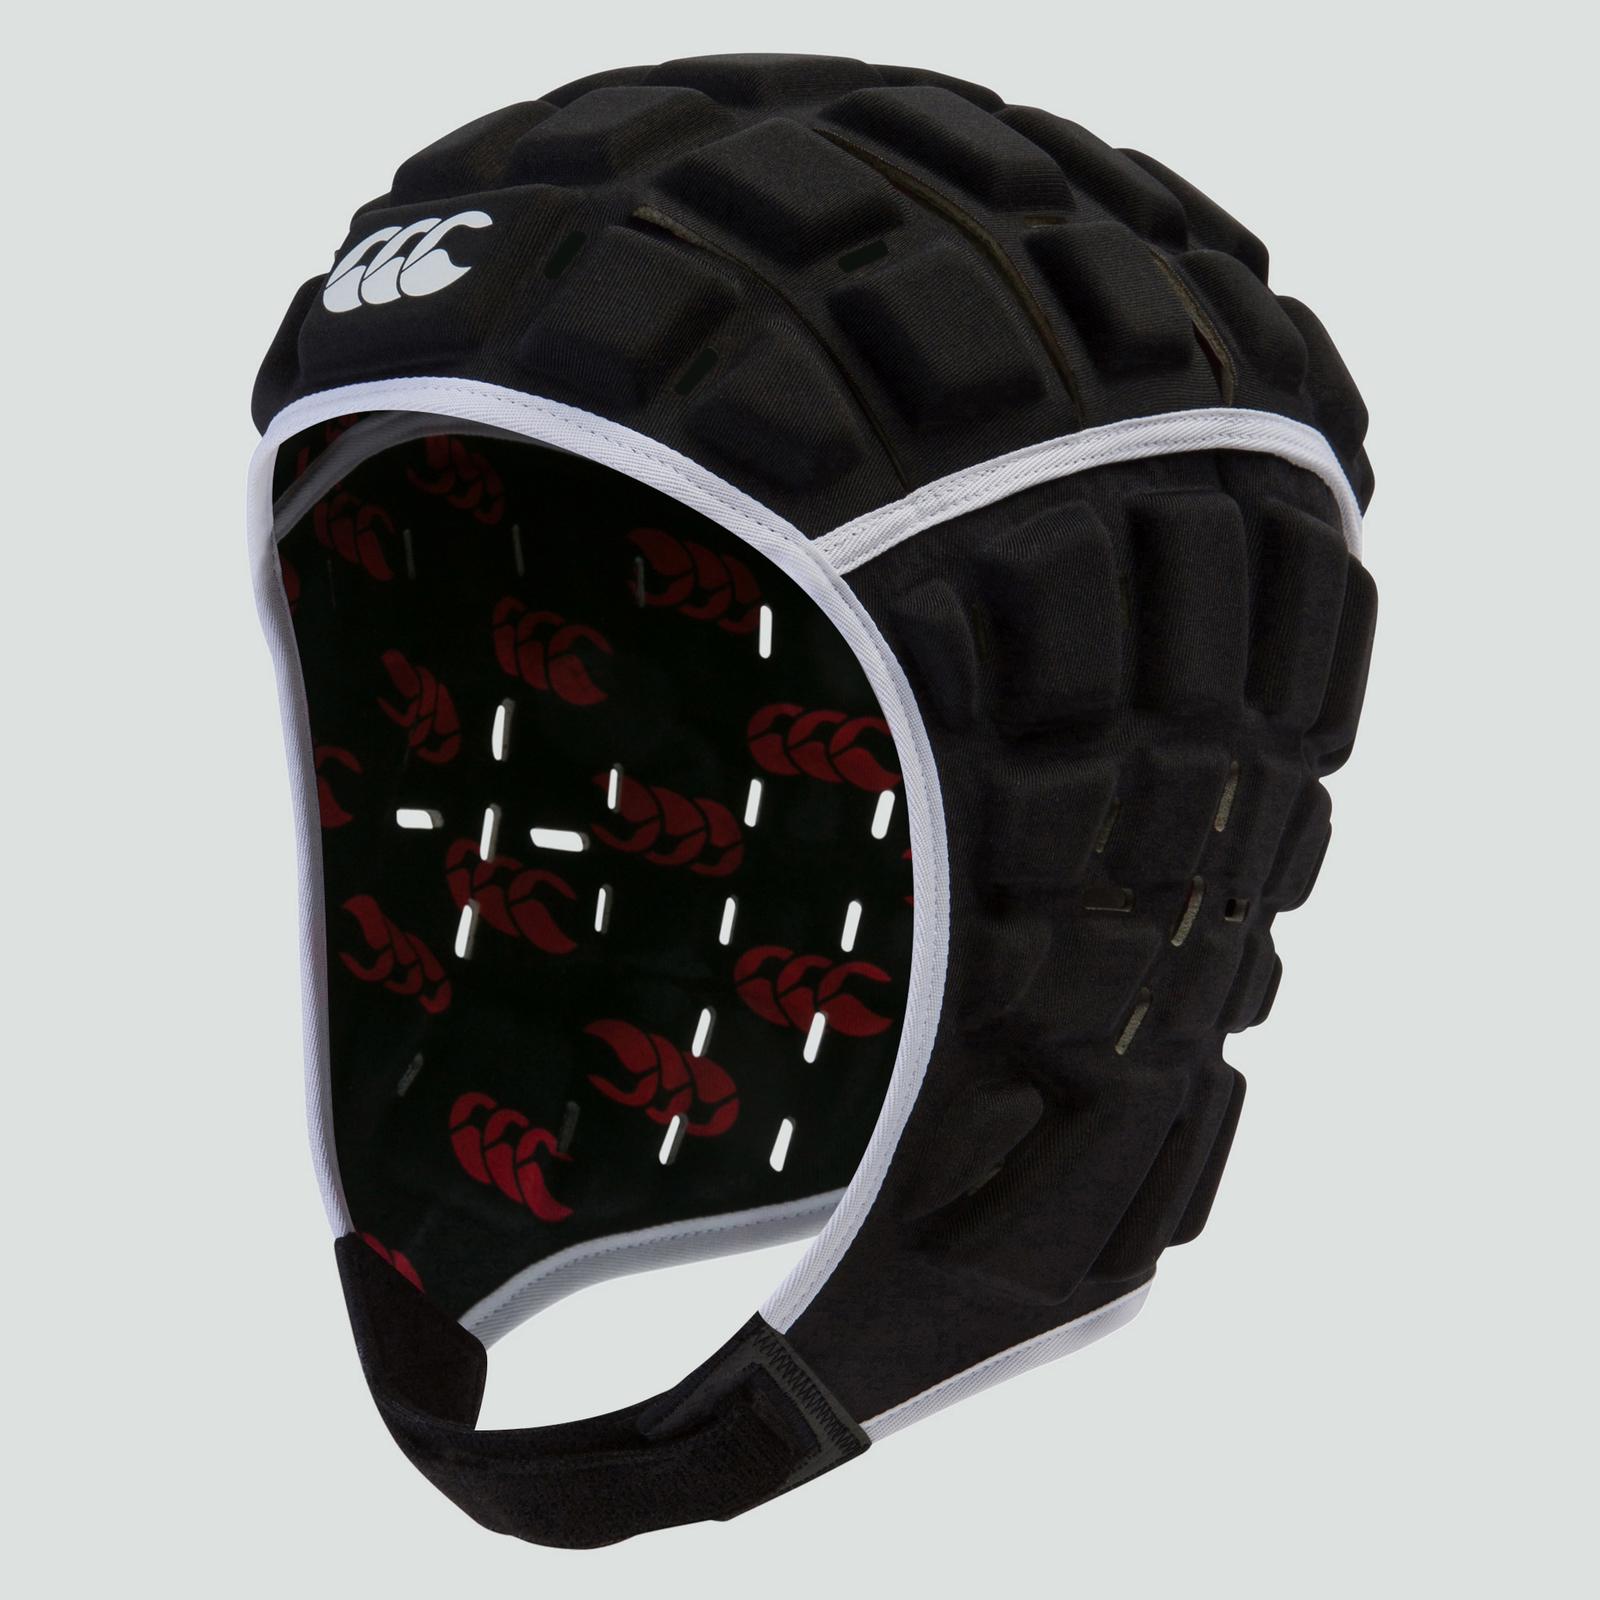 Reinforcer Headguard Junior - MB image